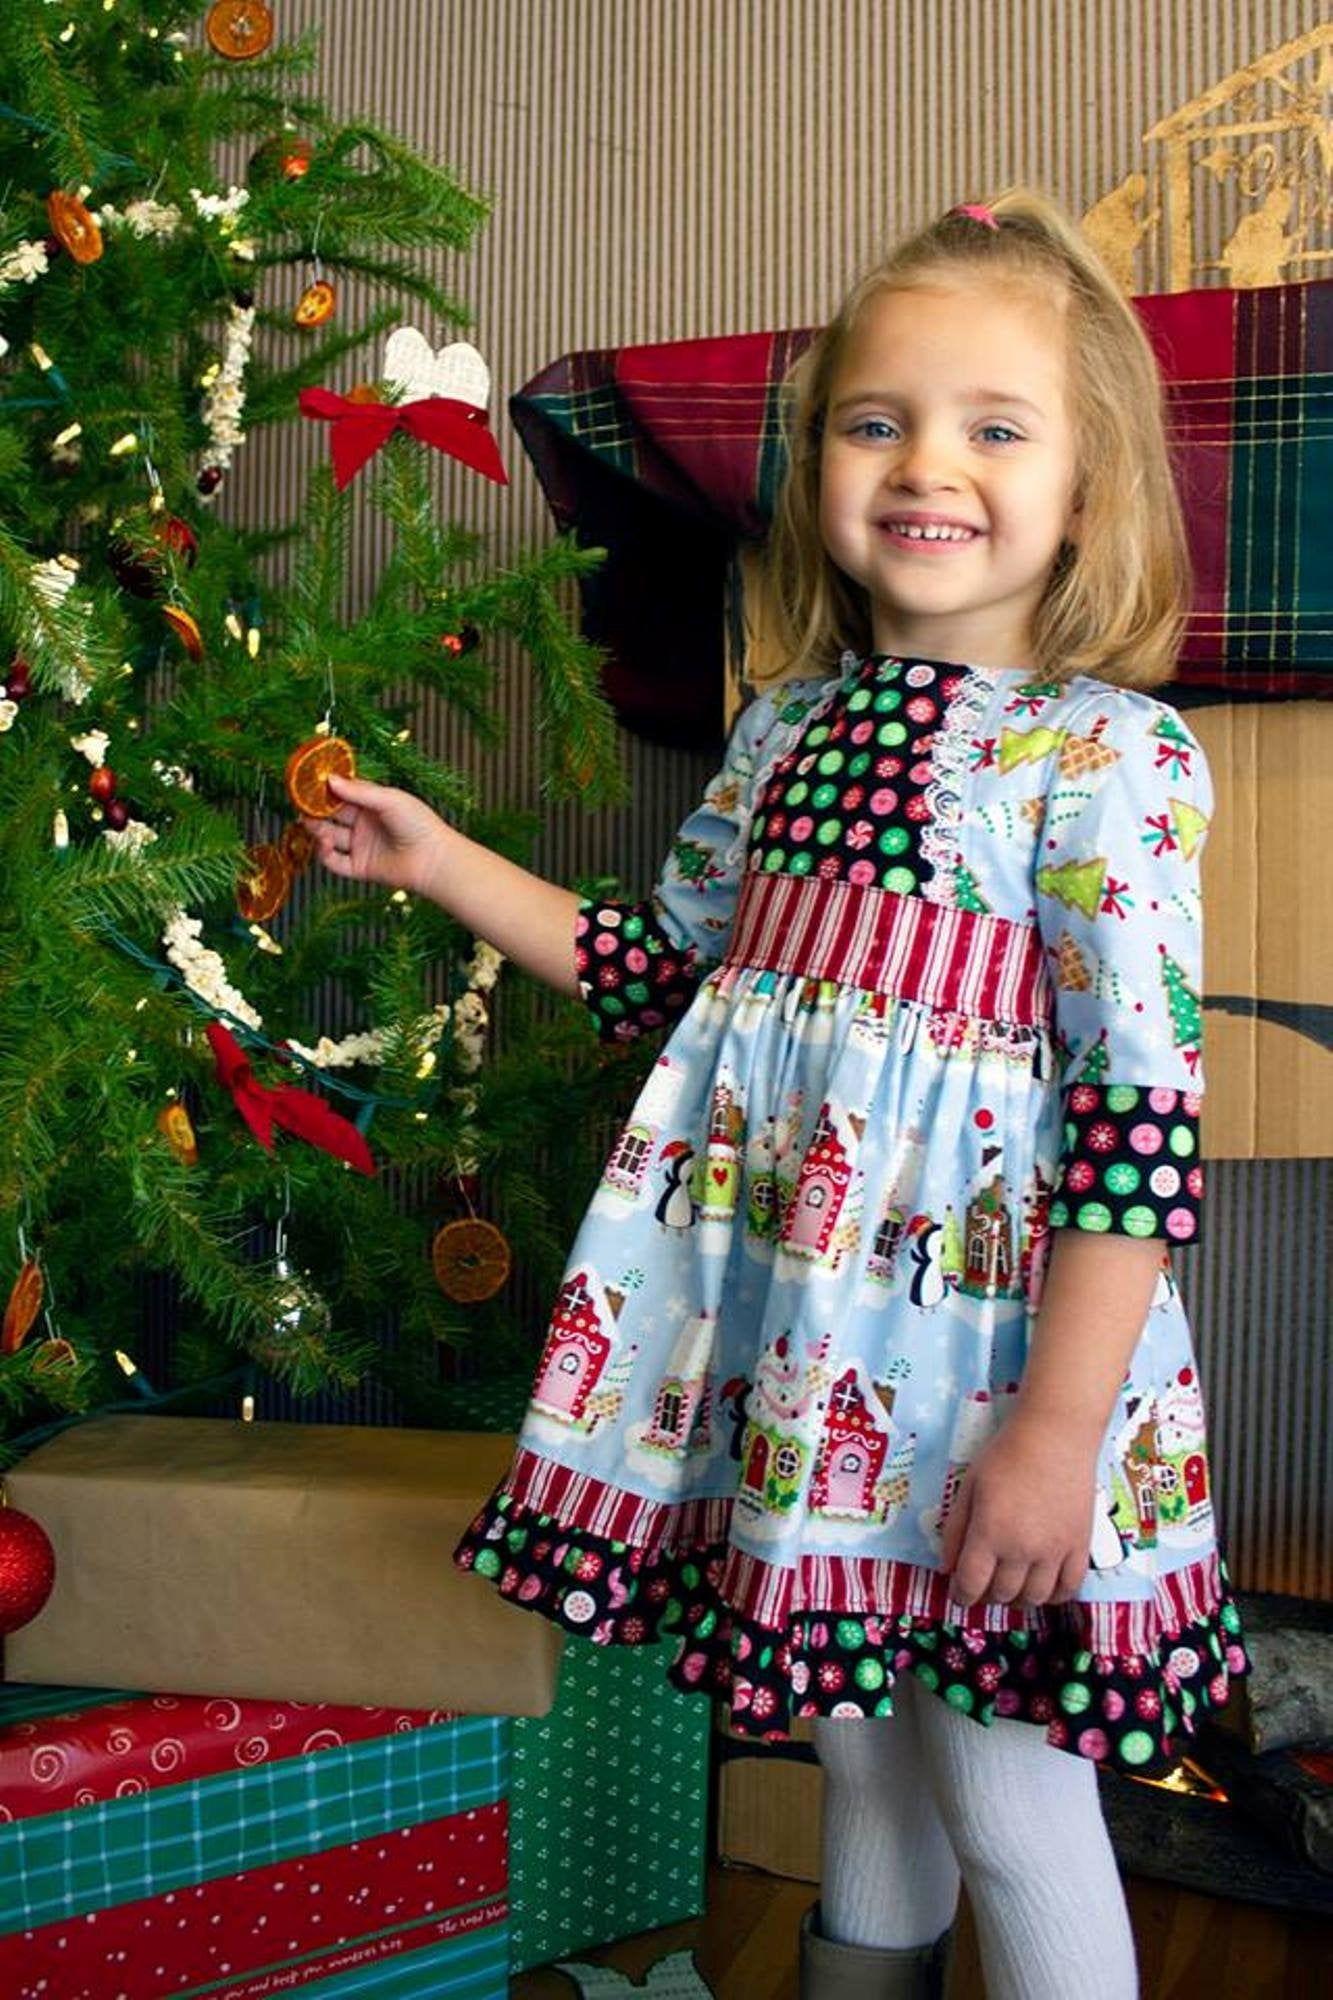 Girl/'s Polka Dot Santa Christmas Dress Ruffled Bow Boutique Outfit Clothing